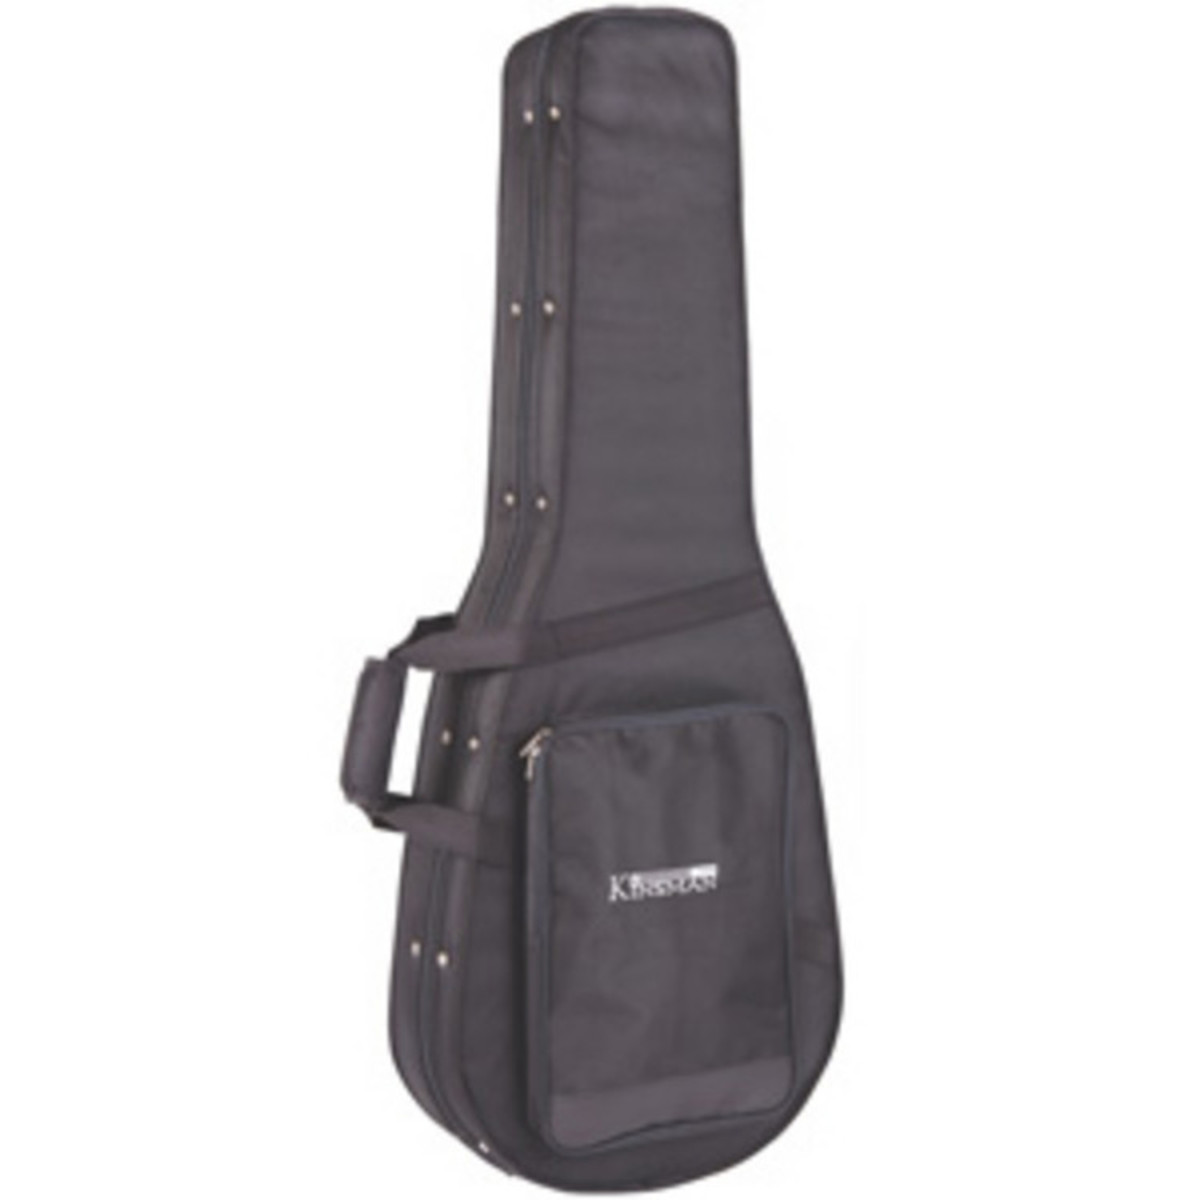 b1747dd21e9 Kinsman Classic Hard Foam Guitar Case, Black at Gear4music